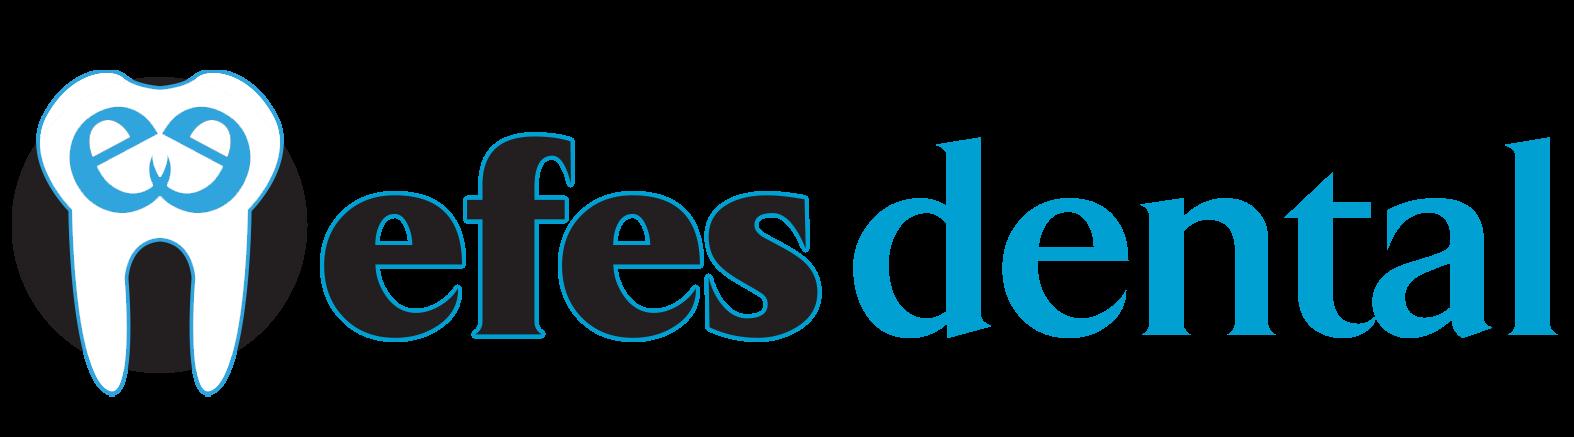 Efes Dental Medikal İç ve Dış Tic. Ltd. Şti.